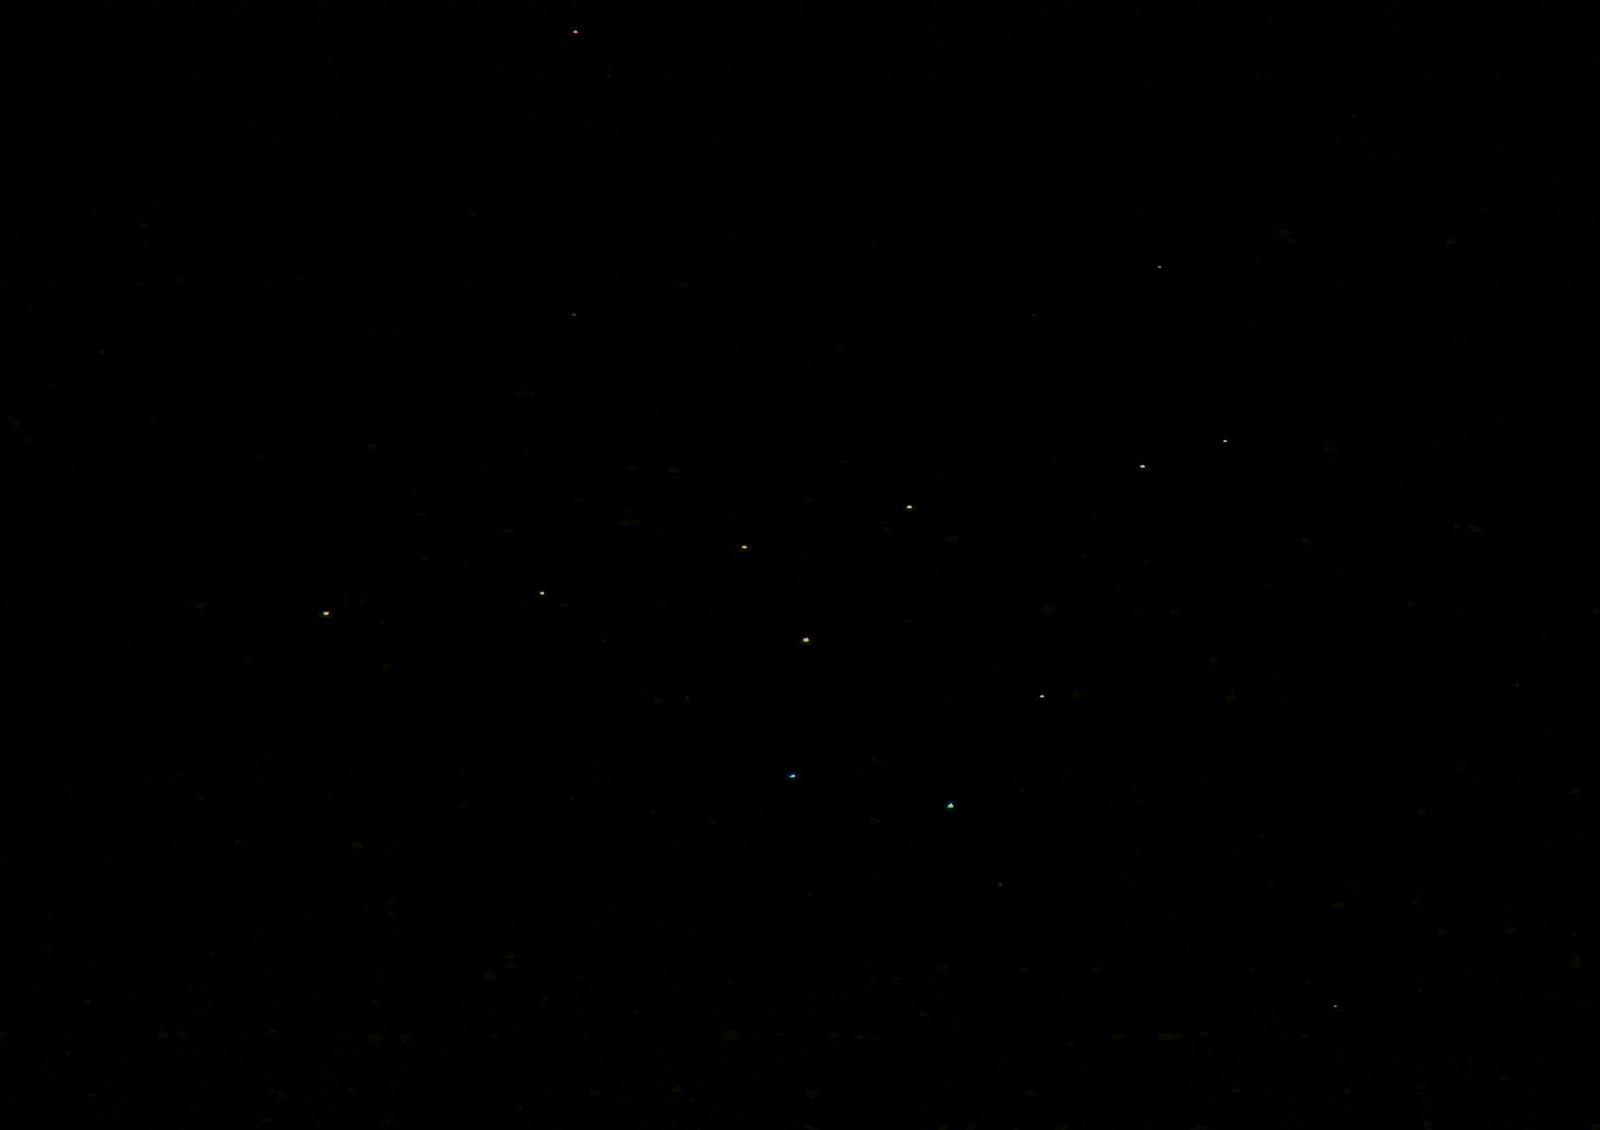 Lumii_20190912_163223881.thumb.jpg.f4124d39e0aeae6165f8f63e7f8d51b3.jpg